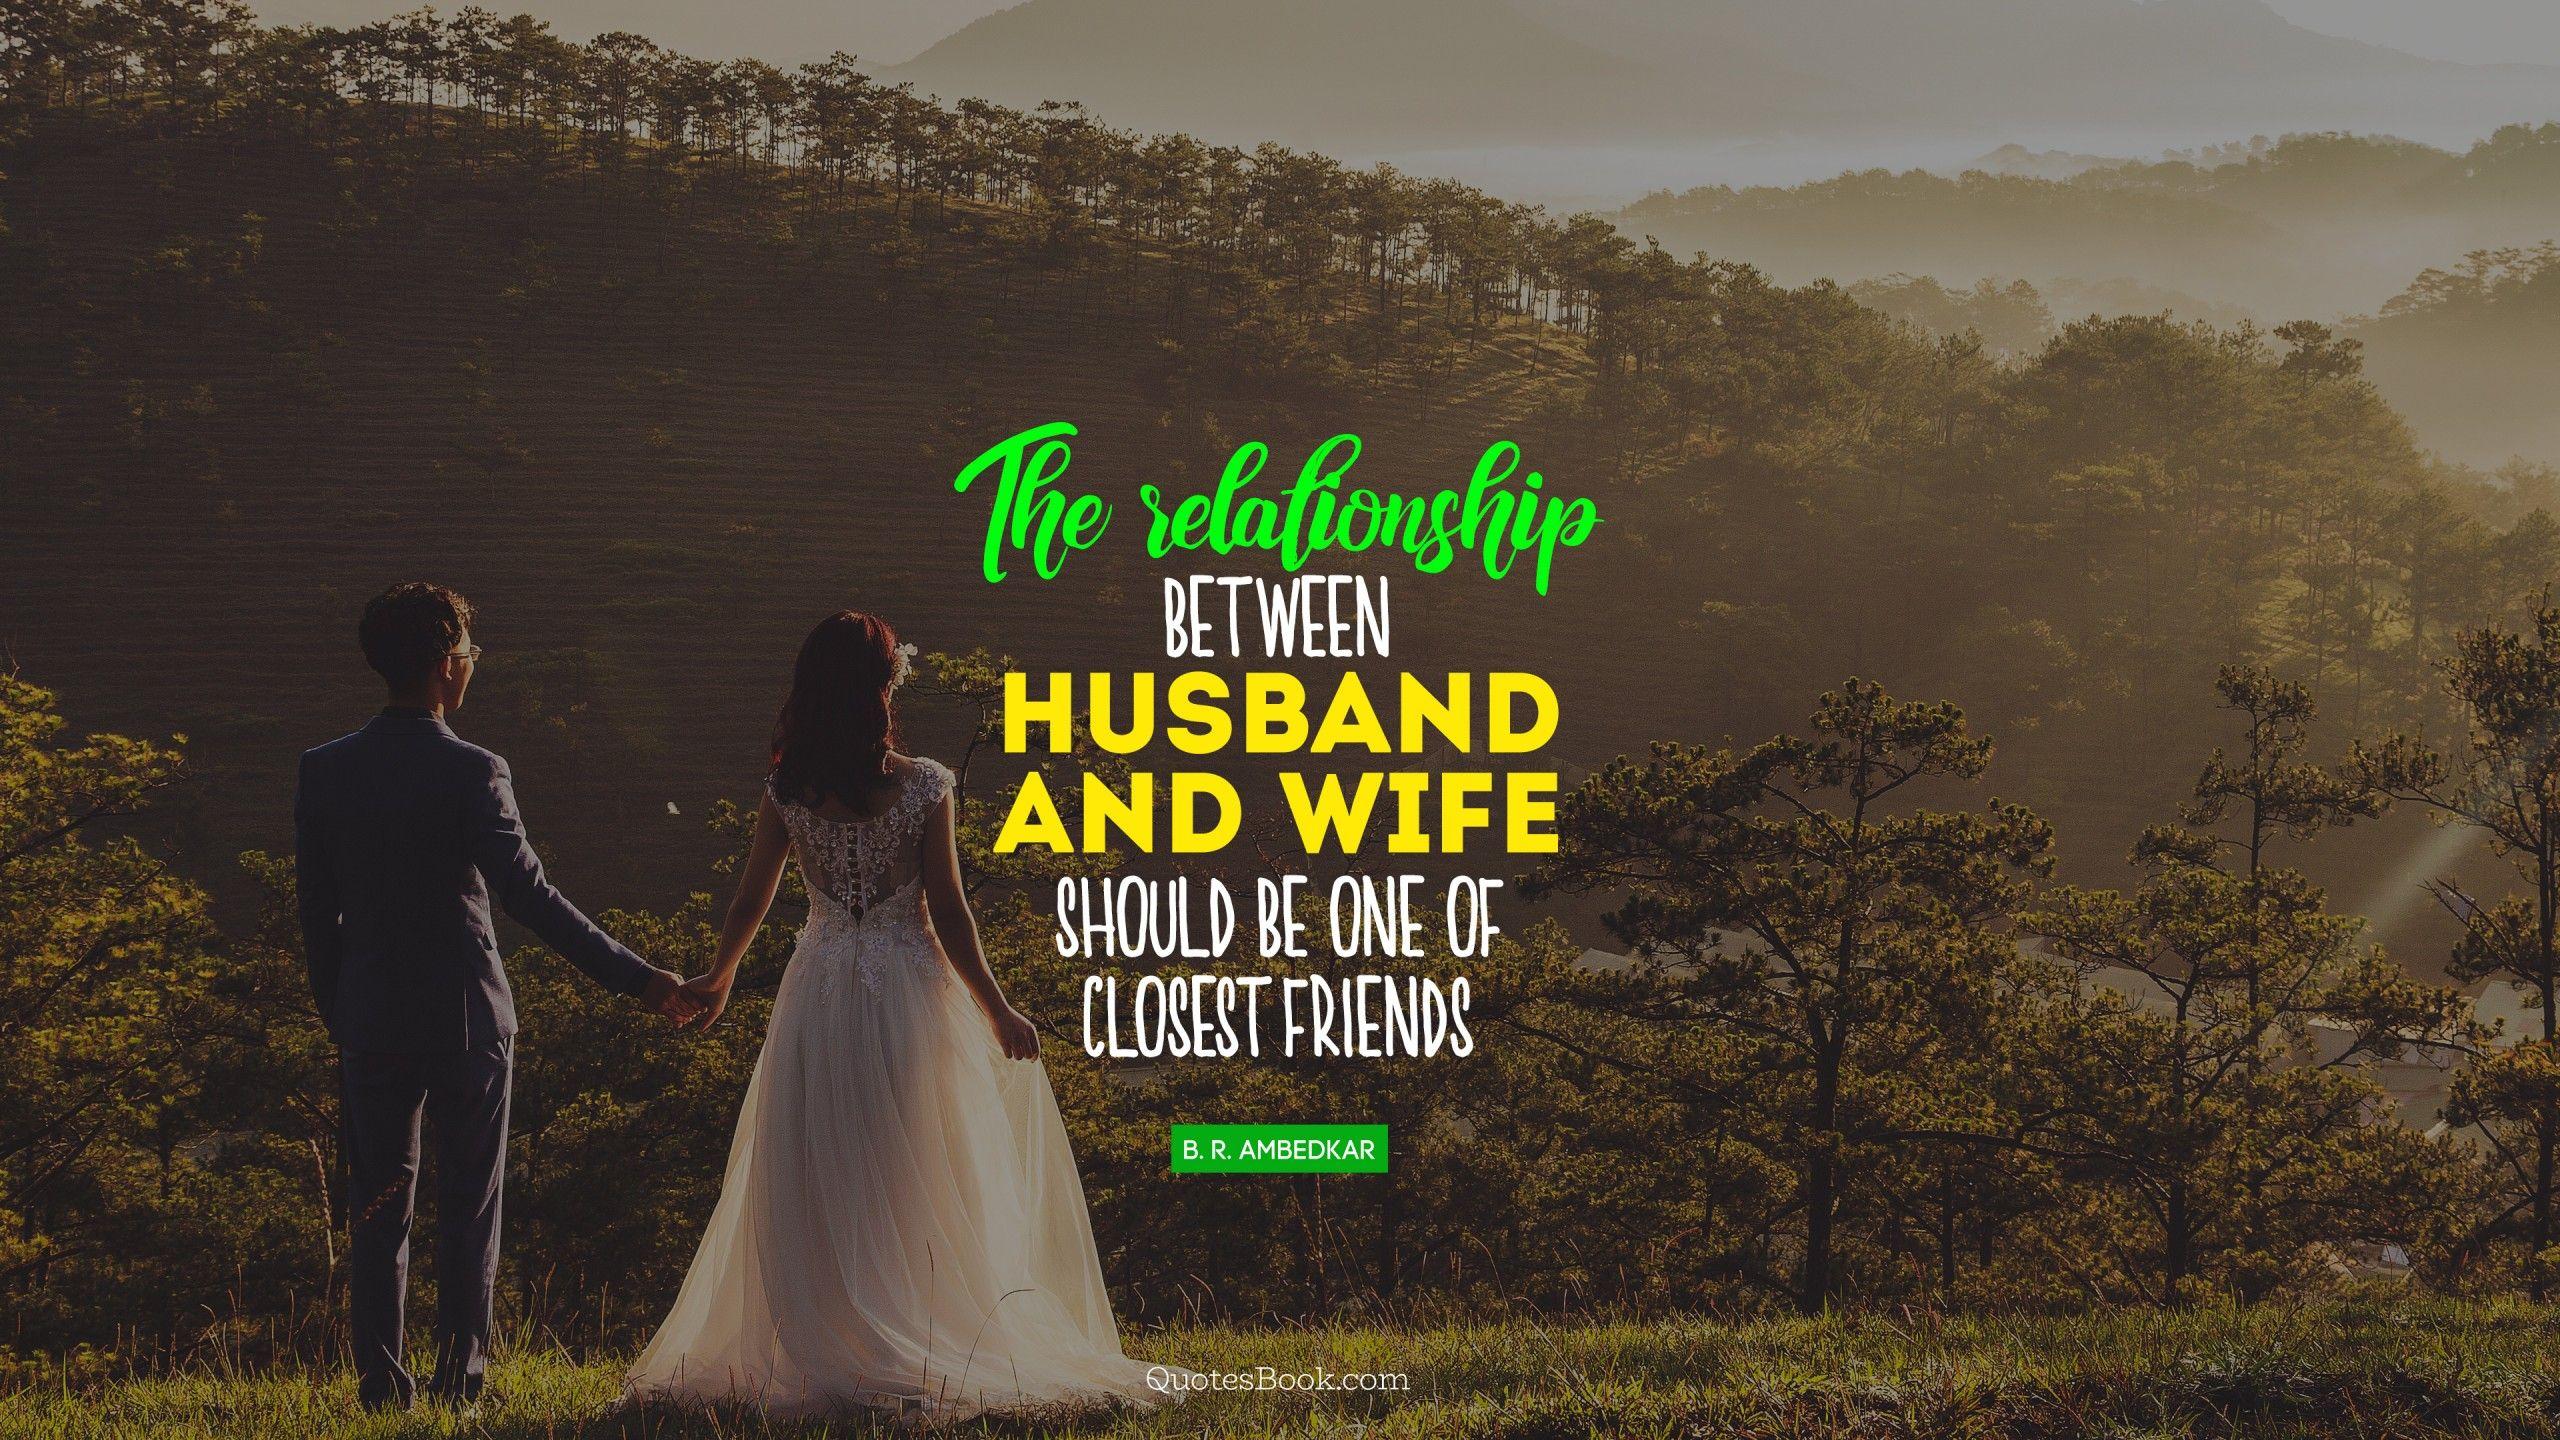 #husband #husbandandwife #husbands #HusbandAndWifeTeam #husbandwife #husbandgoals